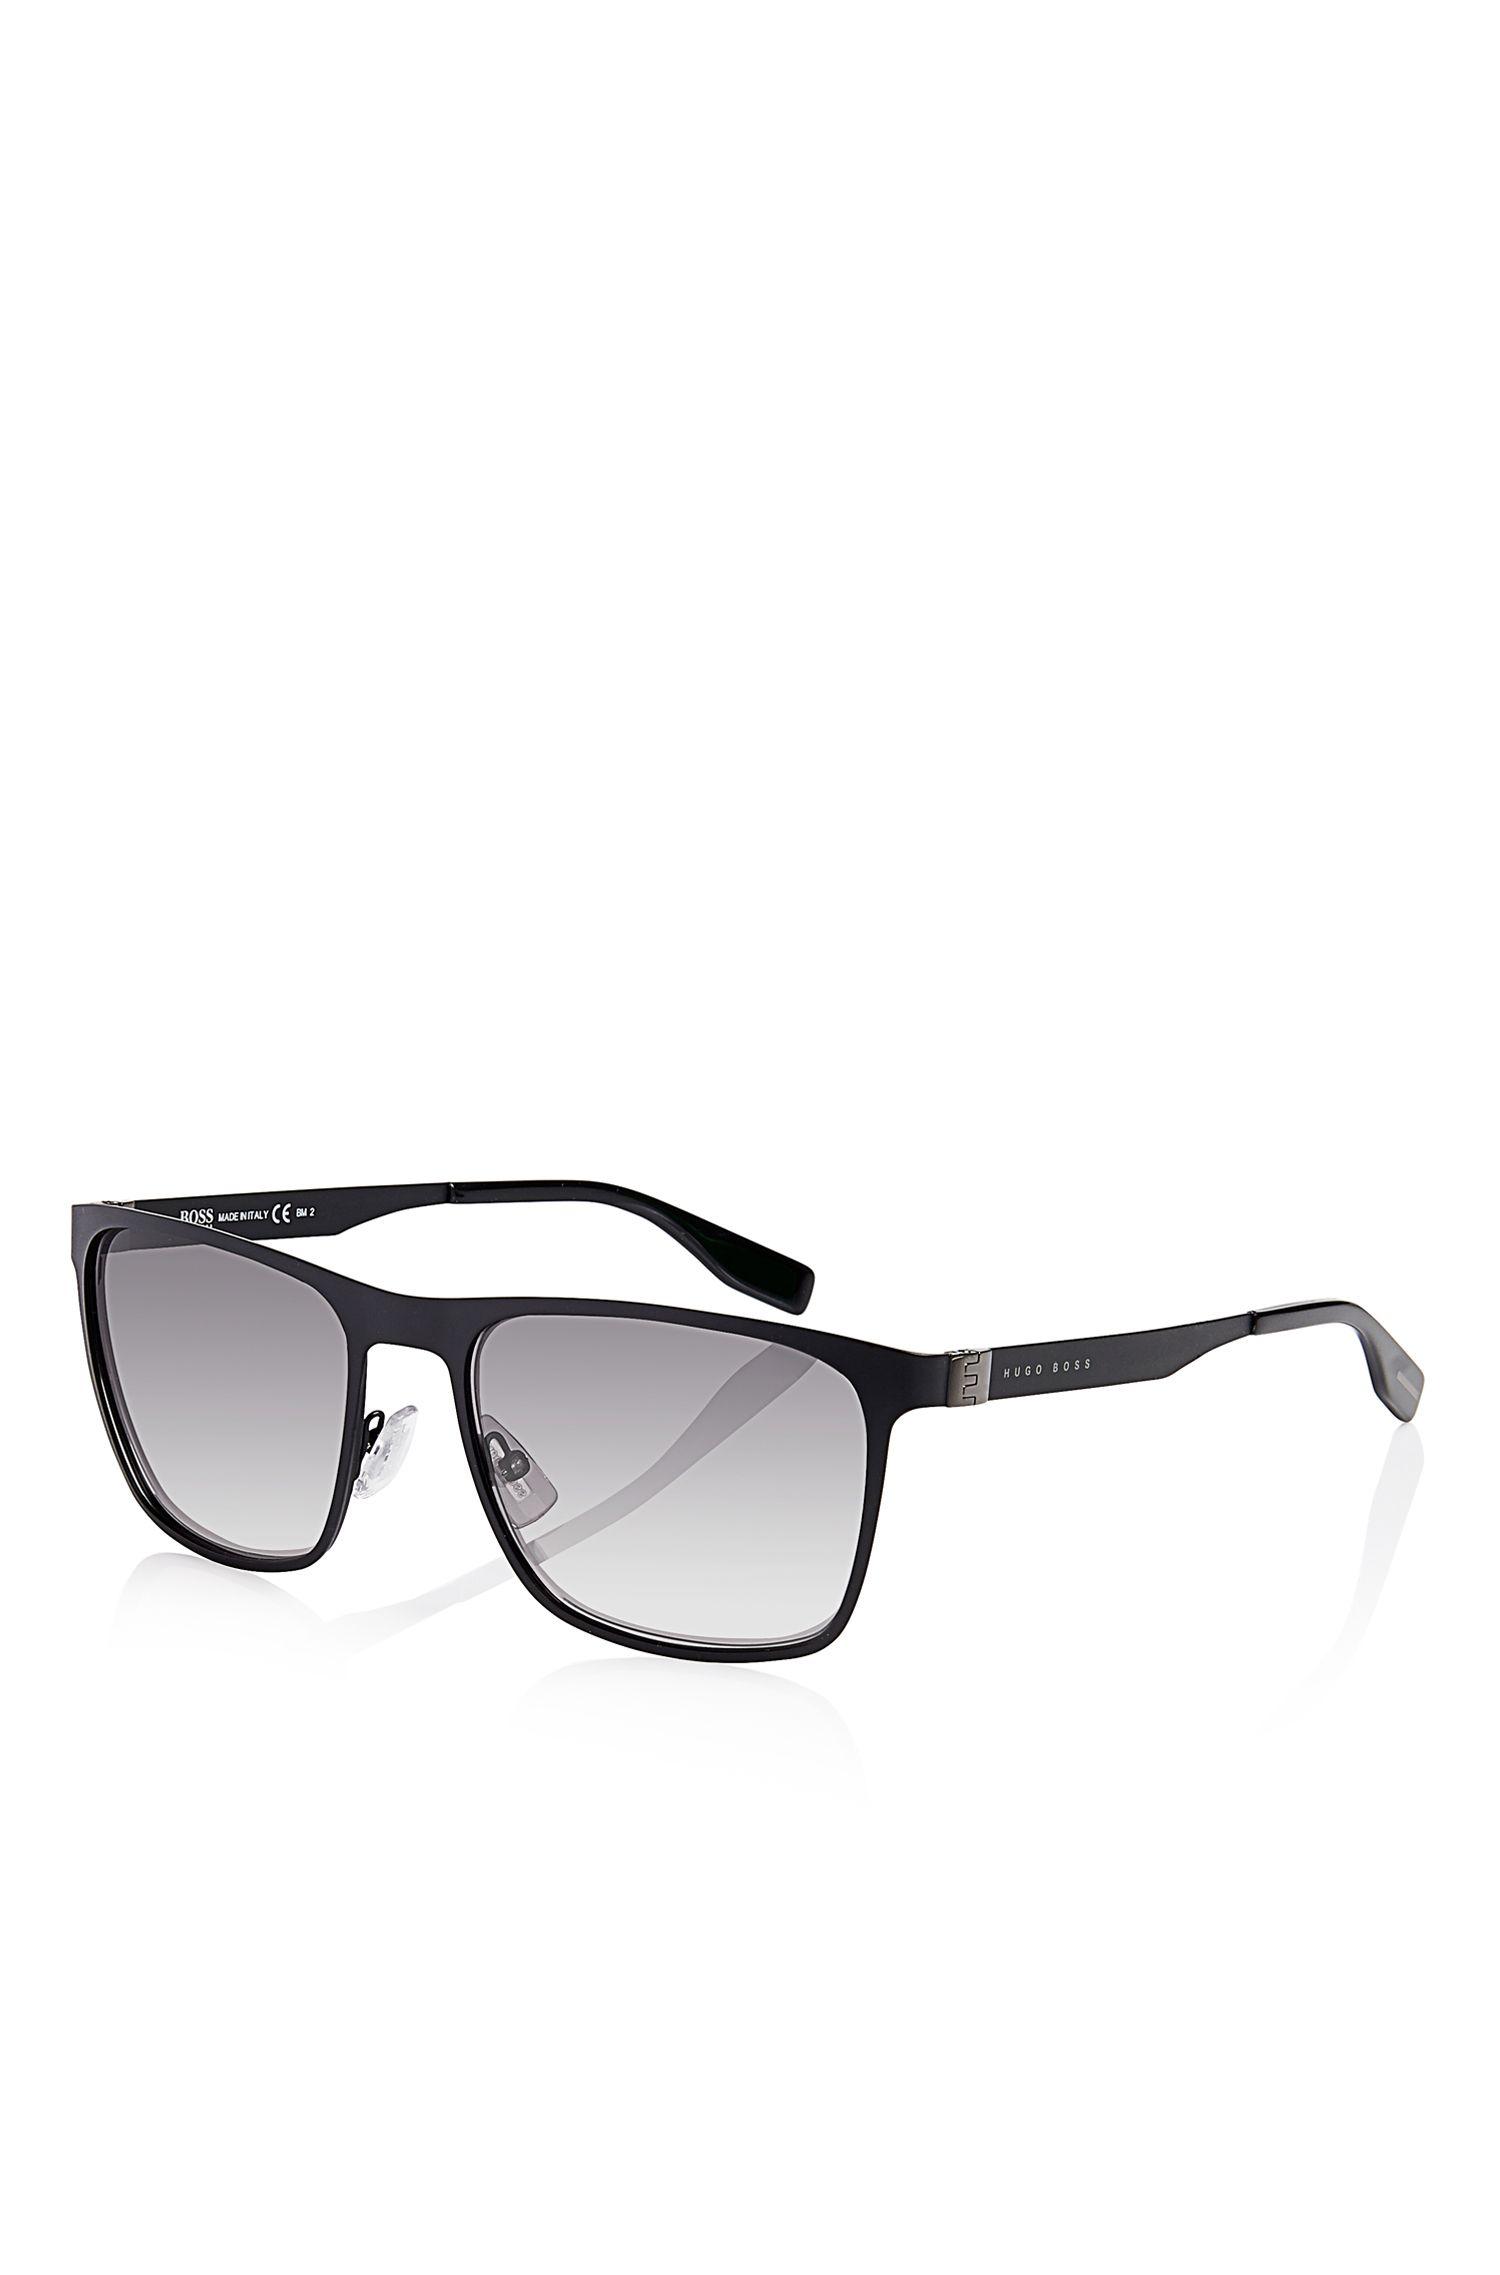 'Sunglasses'   Matte Black Flat Metal Sunglasses